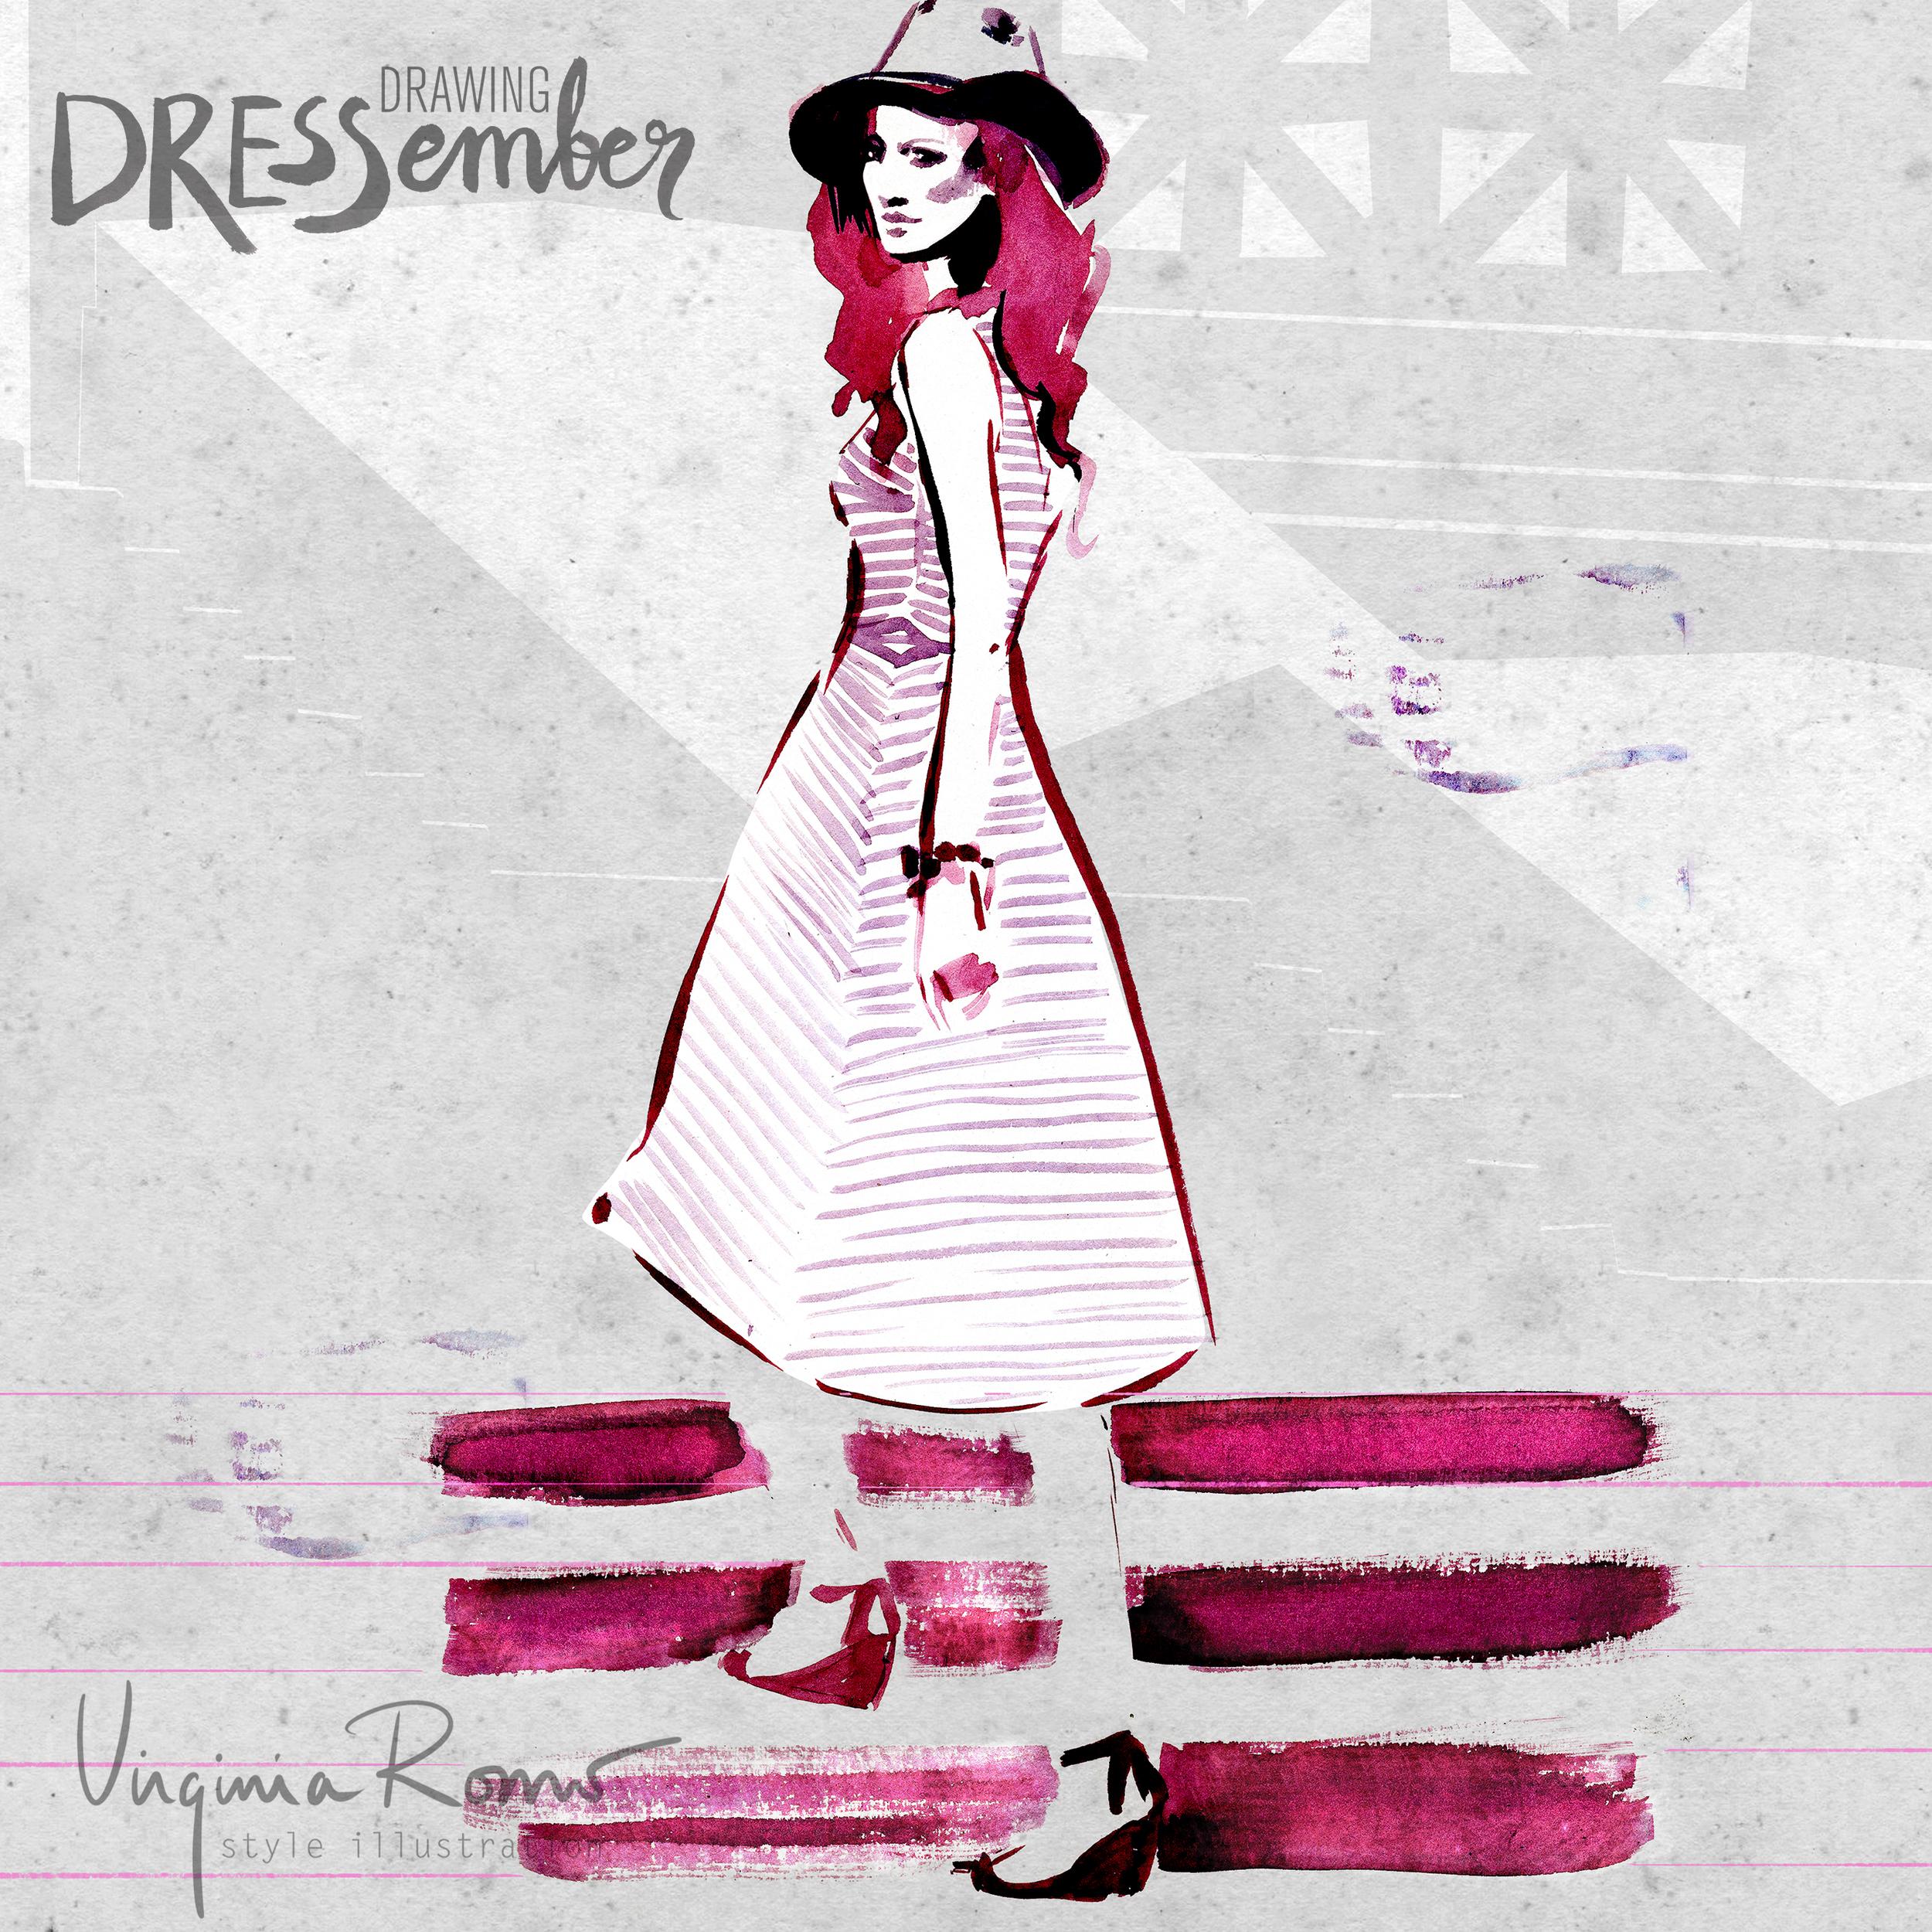 dressember-VirginiaRomoIllustration-21-ElizabethCool-IG.jpg